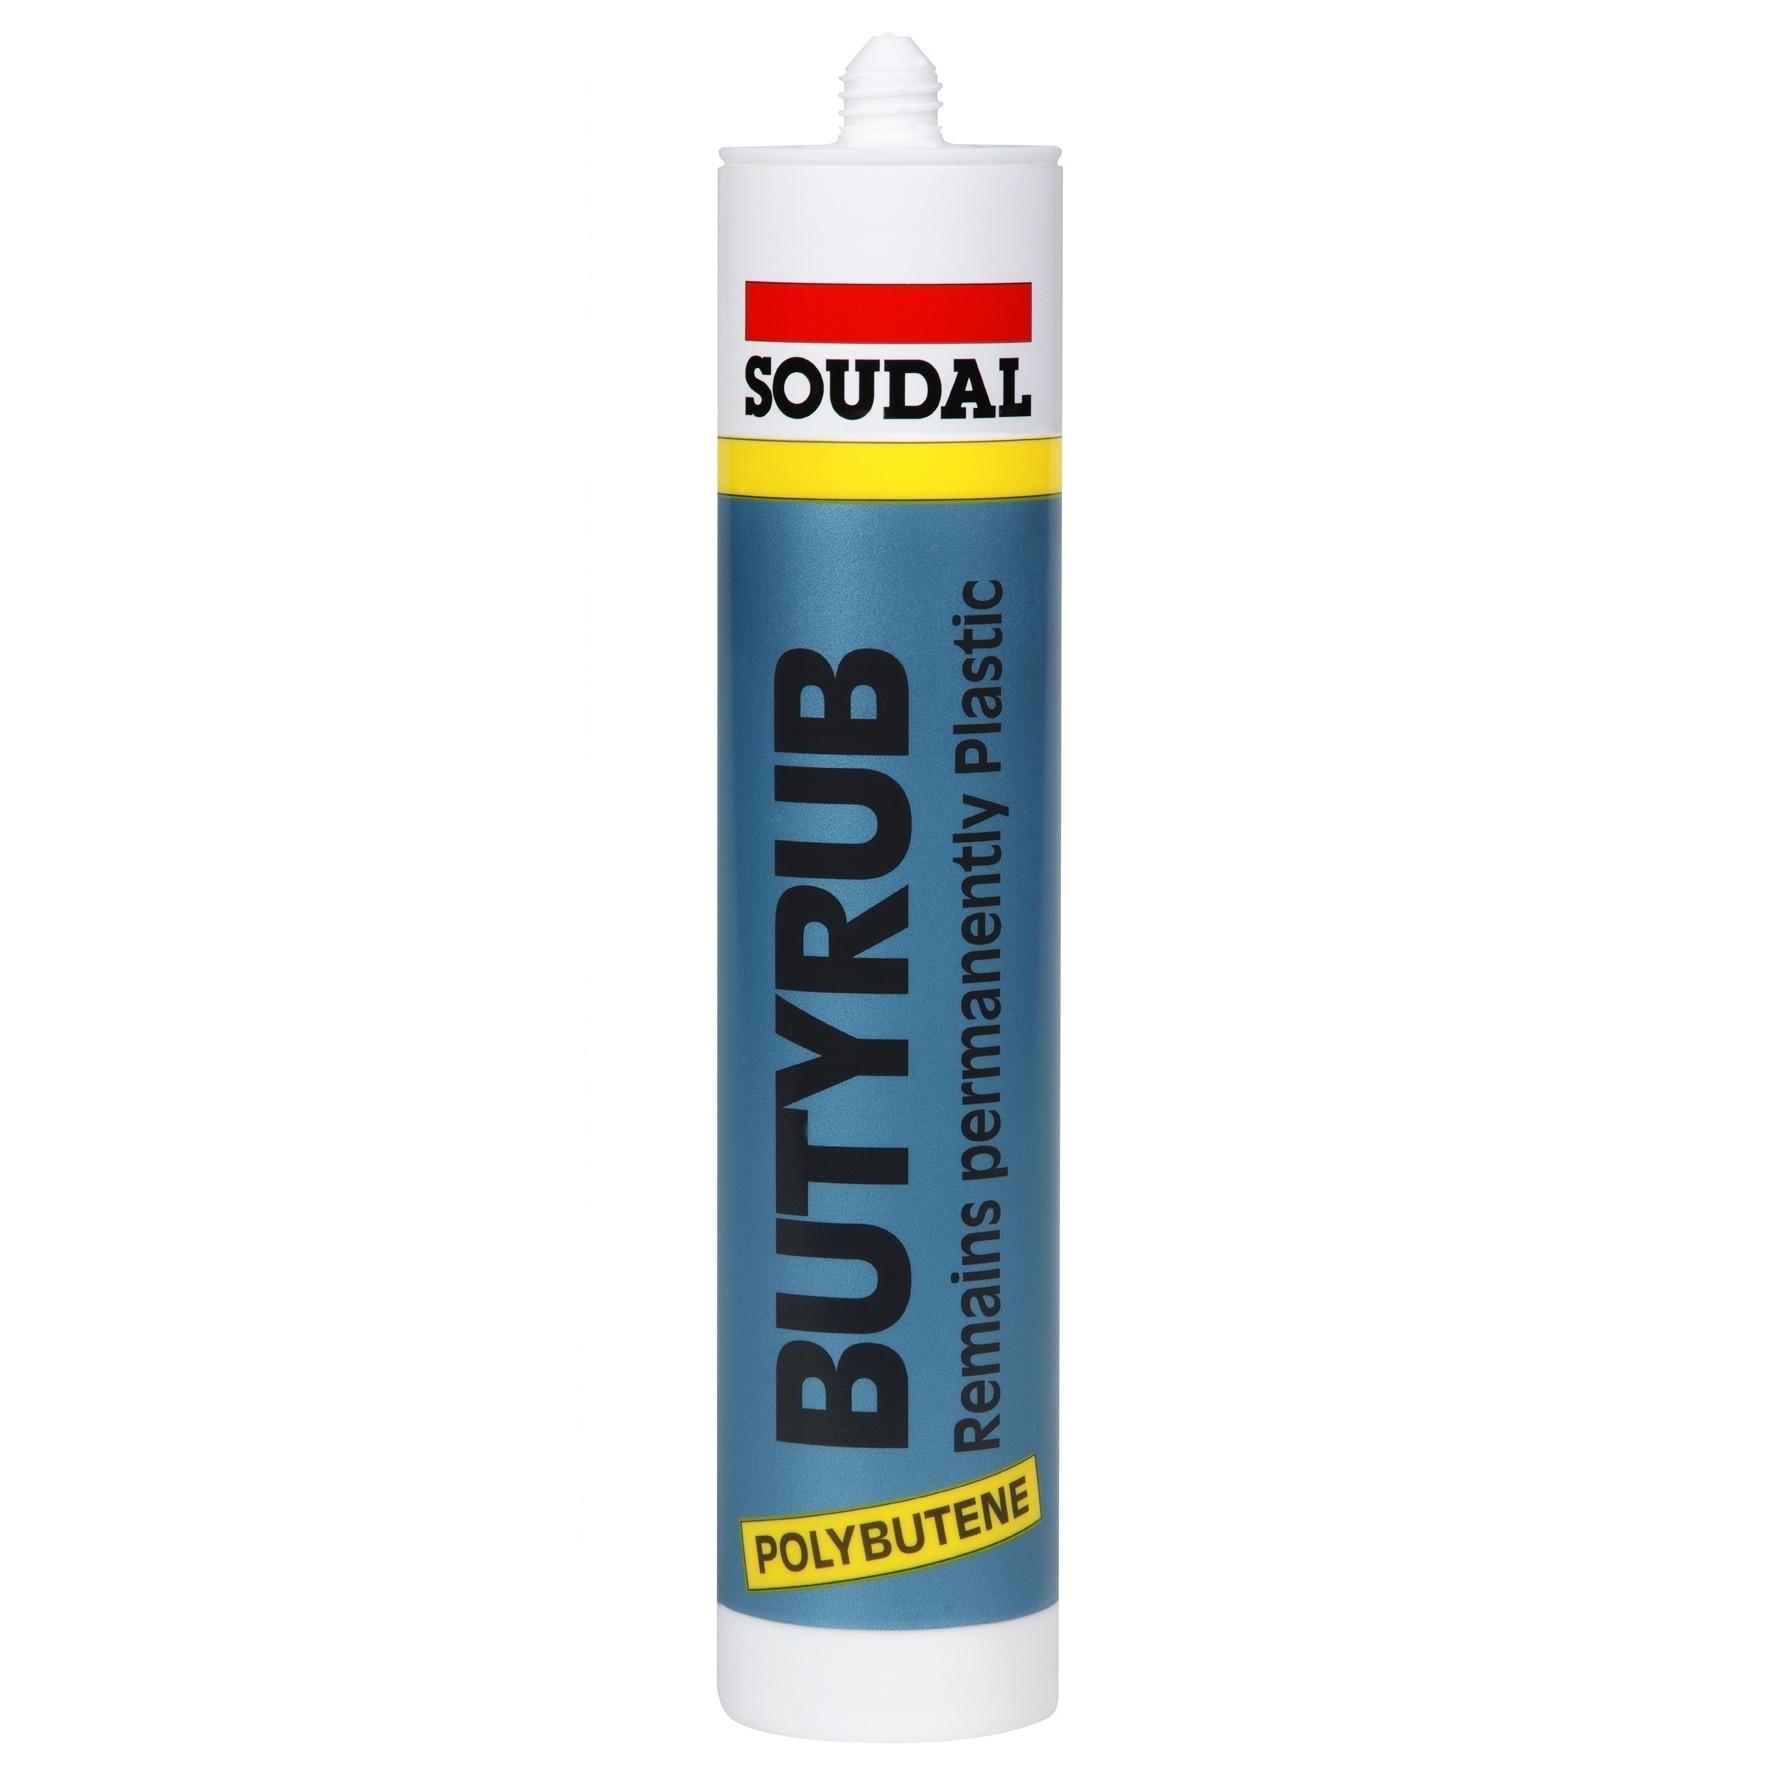 Soudal Butyrub Mastic Black Sealant 310ml